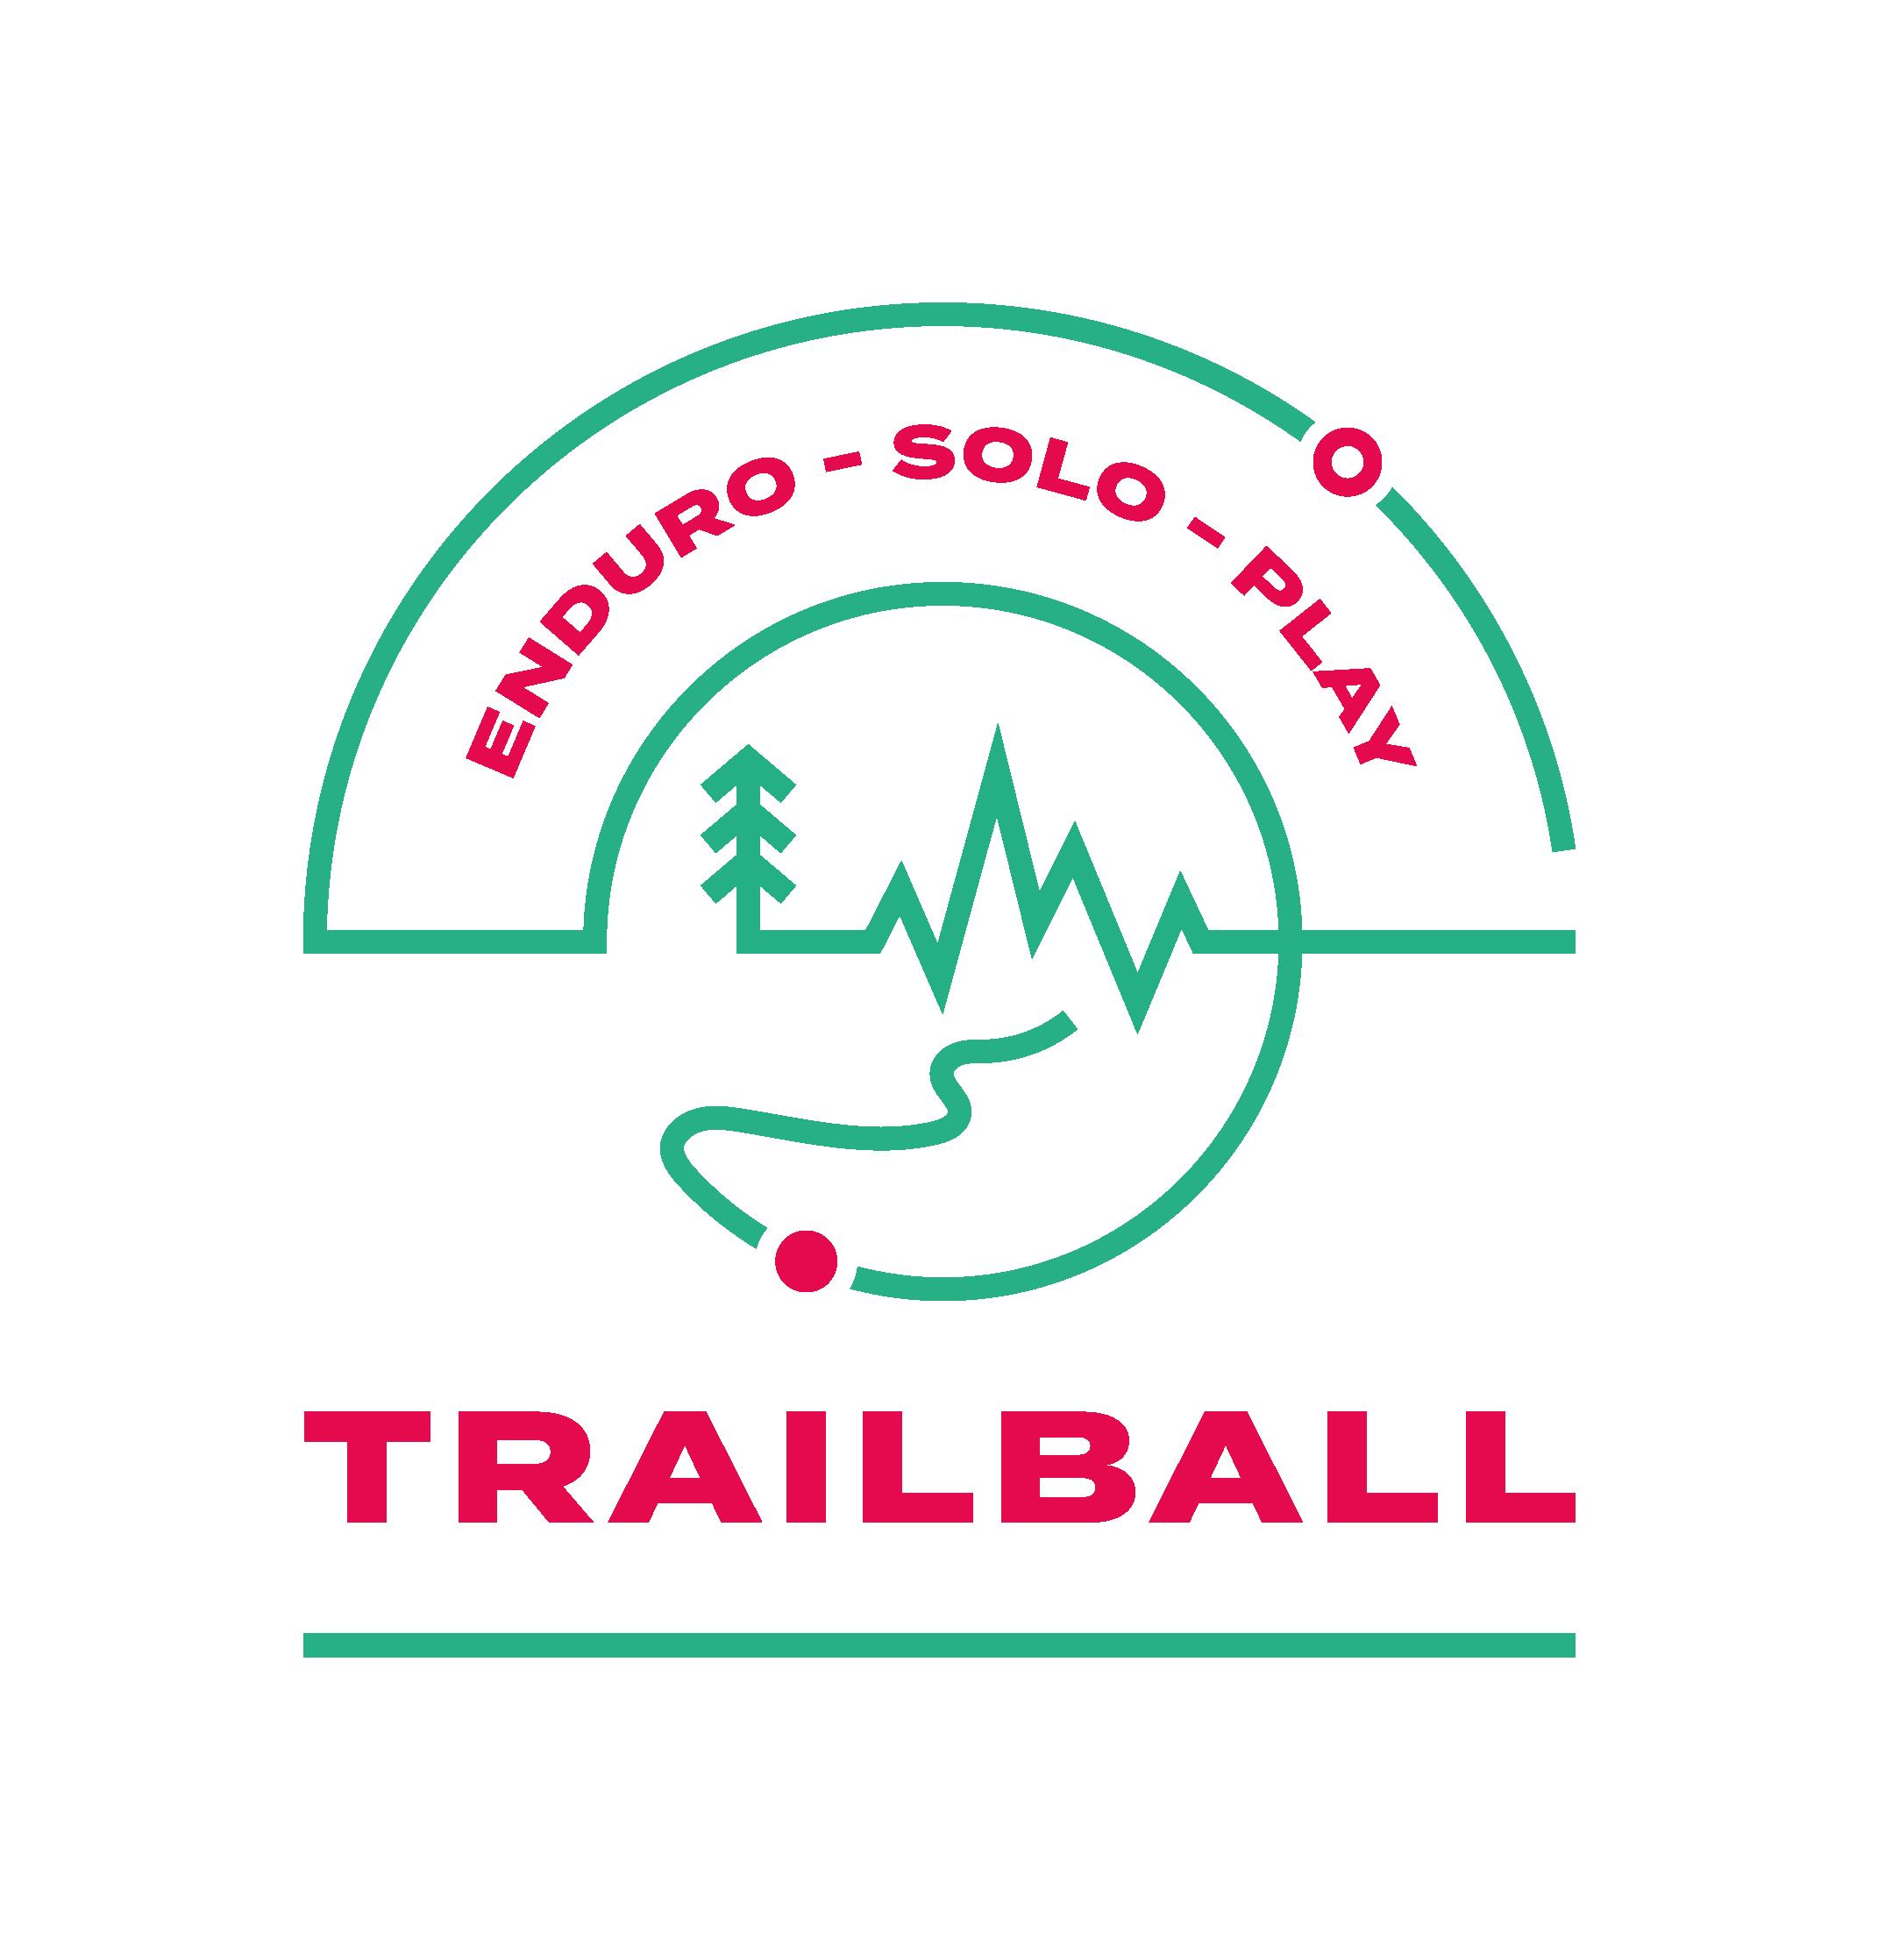 Logo TRAILBALL Enduro - Déclinaison Play Solo